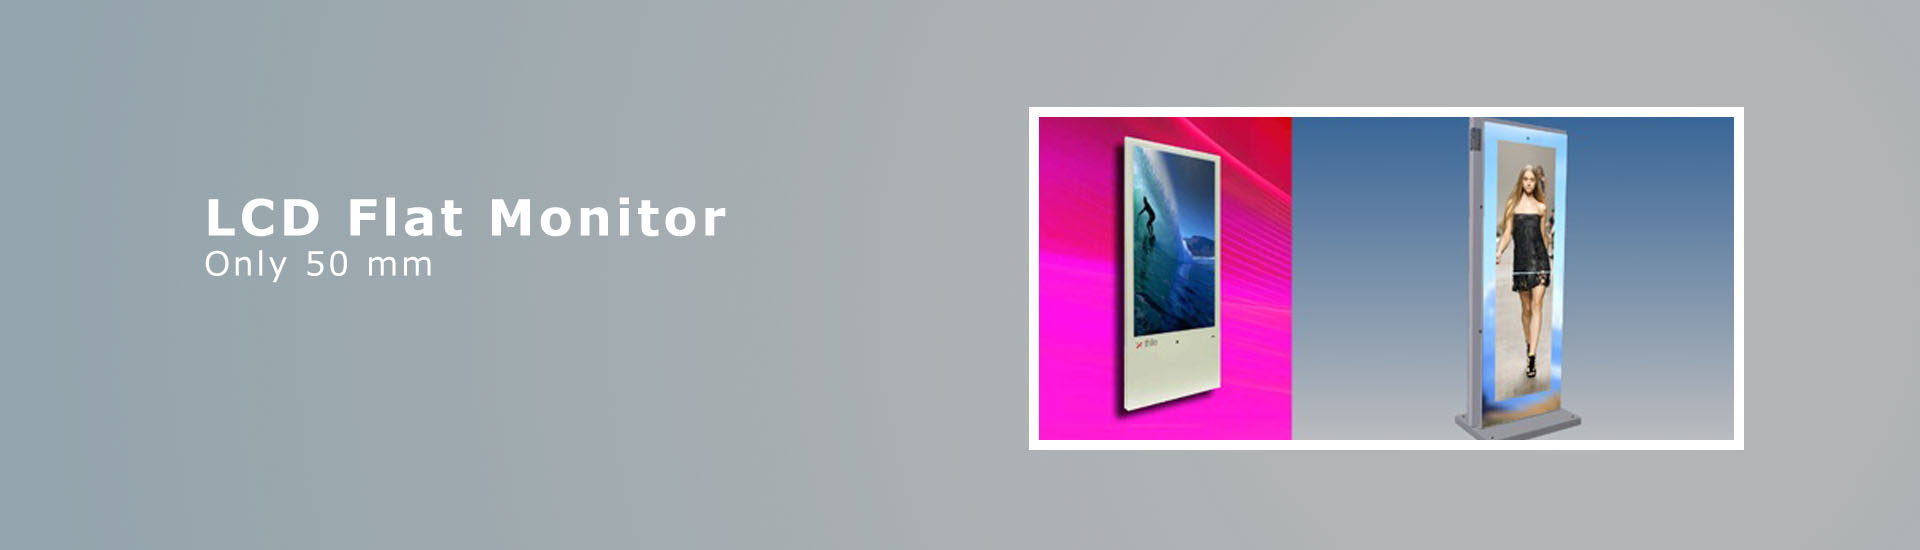 LCD-Flat-Monitor-display-Ondemant